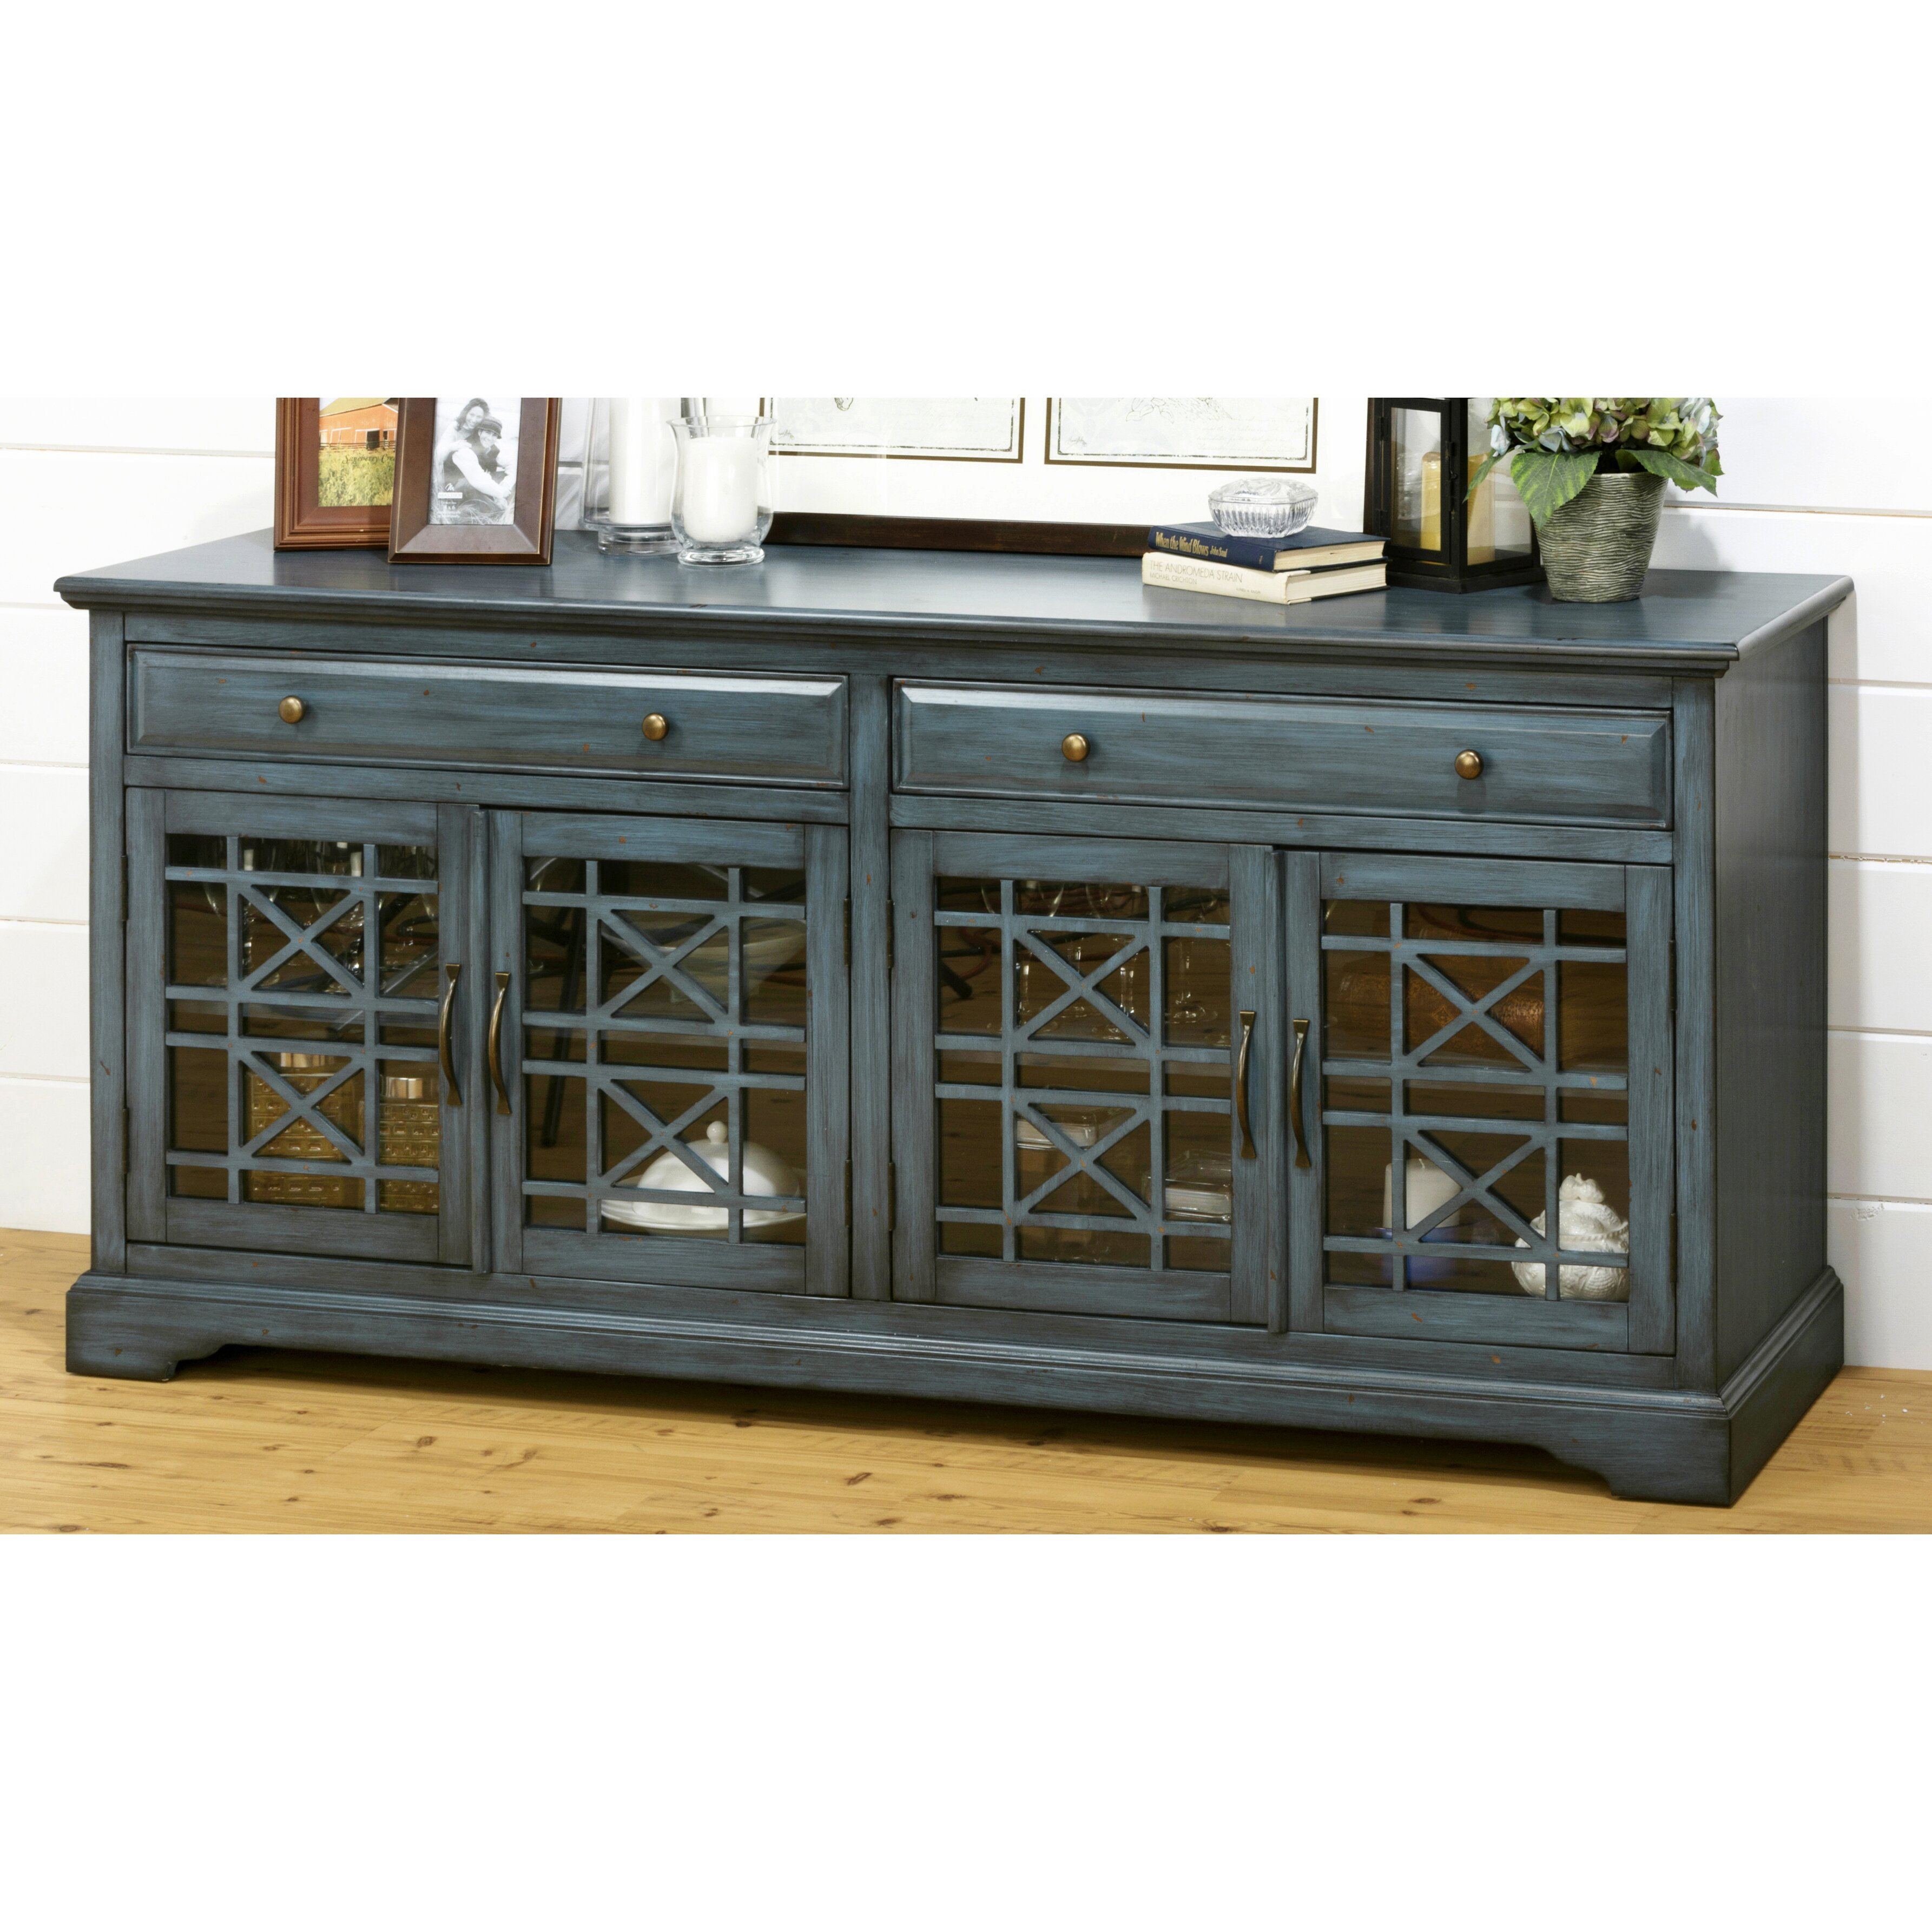 jofran antique tv stand reviews wayfair. Black Bedroom Furniture Sets. Home Design Ideas